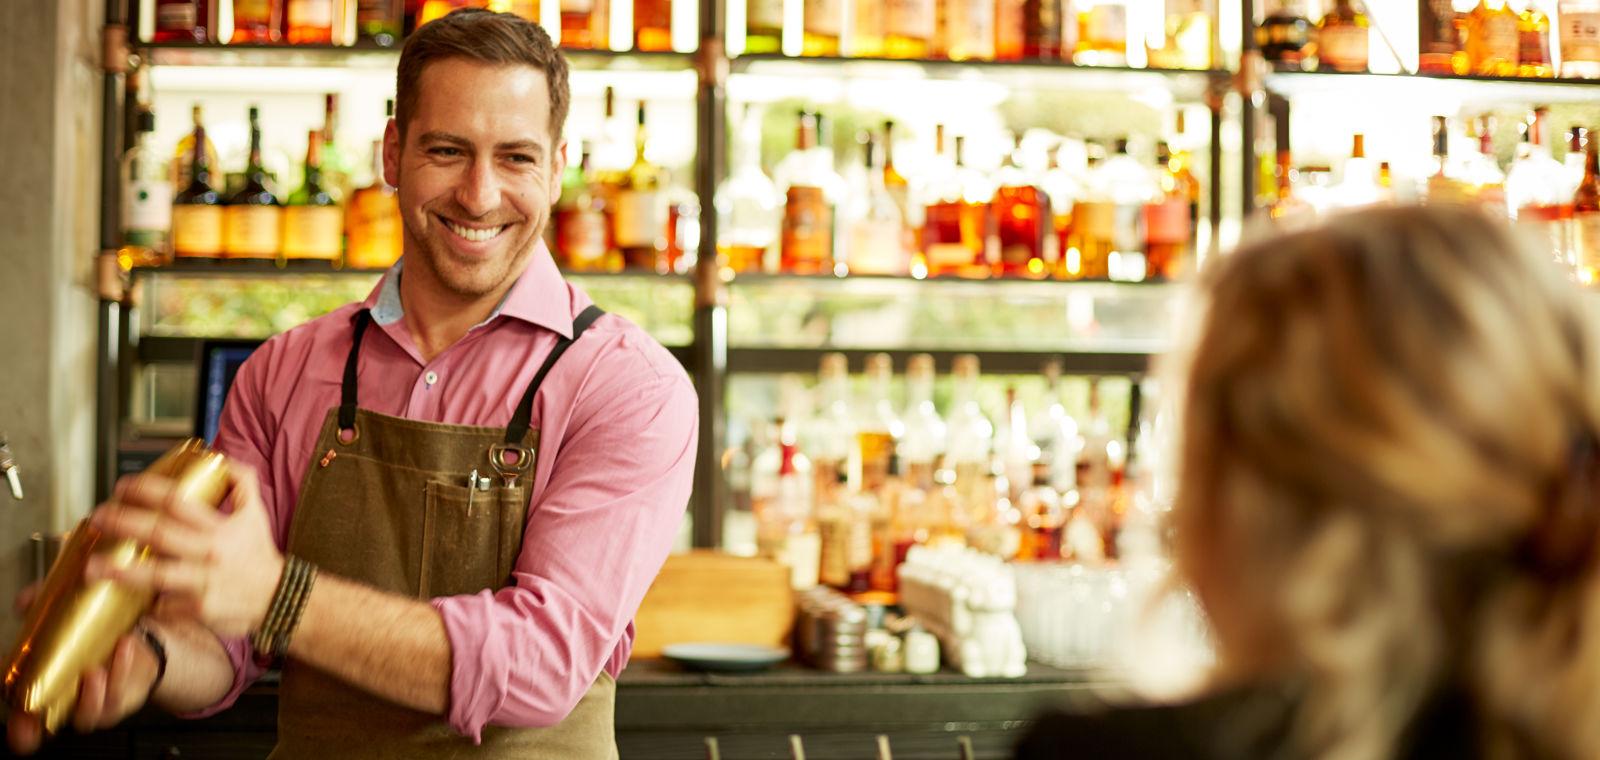 HotelKabuki_Lobby_Bar_Bartender32_Hero_Lifestyle_web